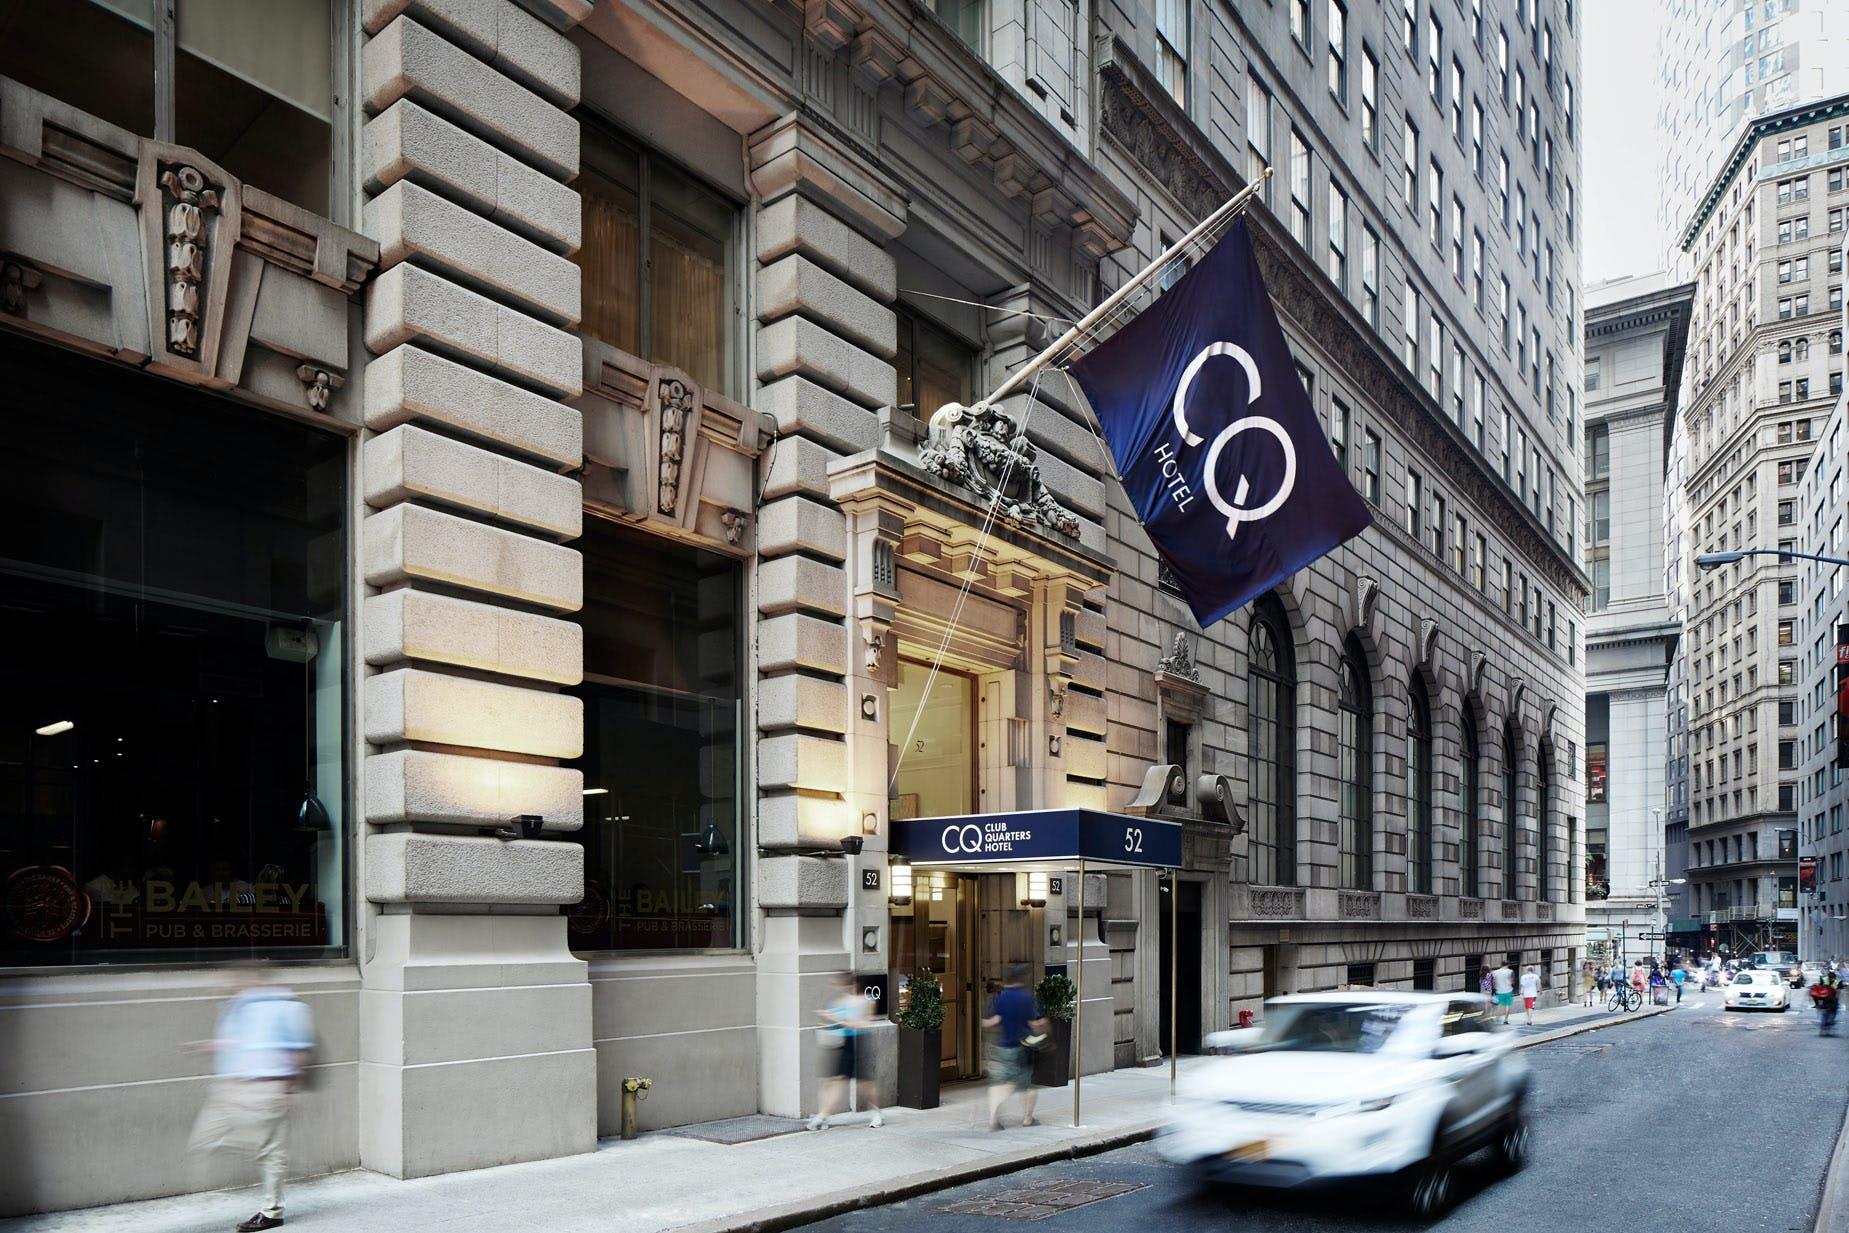 Club Quarters Hotel Nyc Wall Street